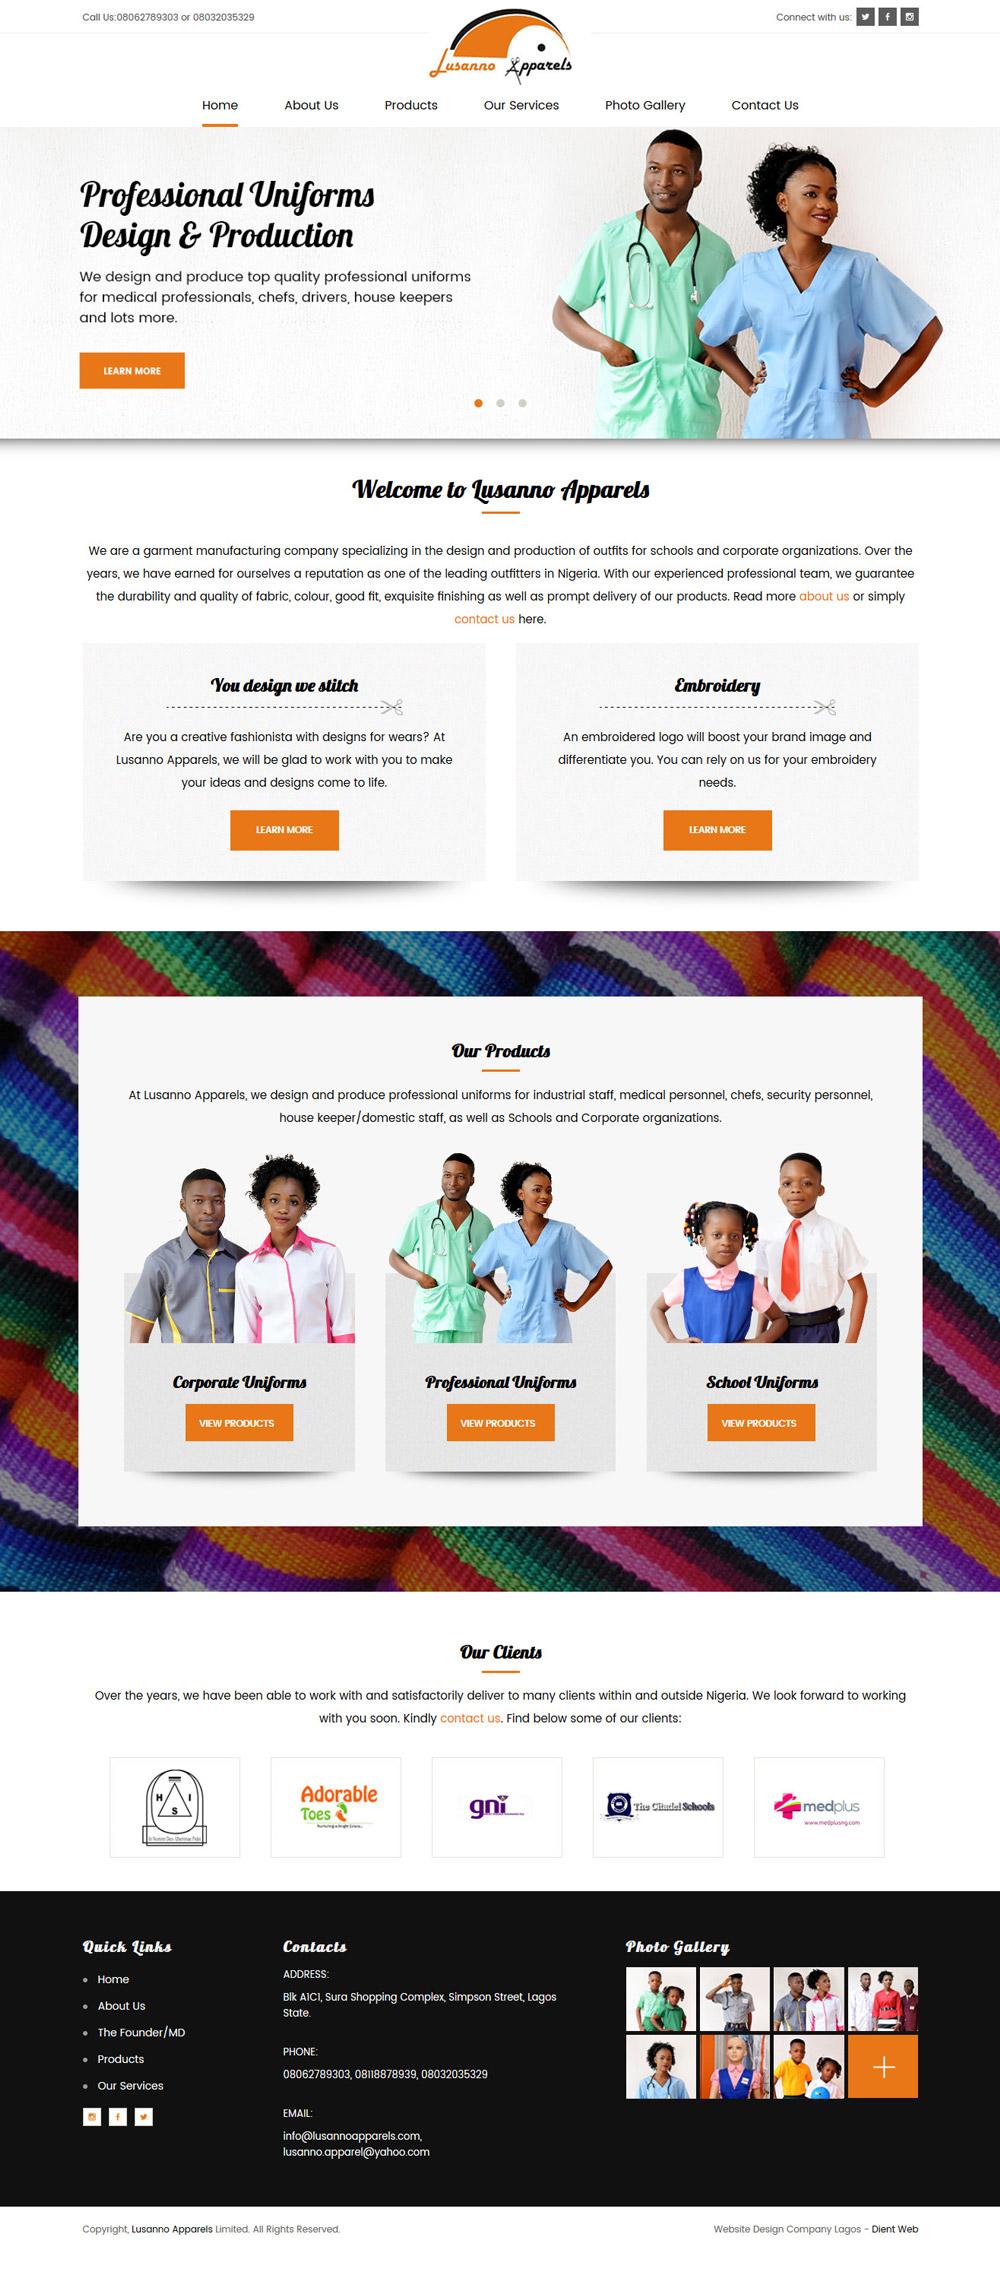 website design for lussano apparels by DientWeb the best web designer in lagos nigeria home page design